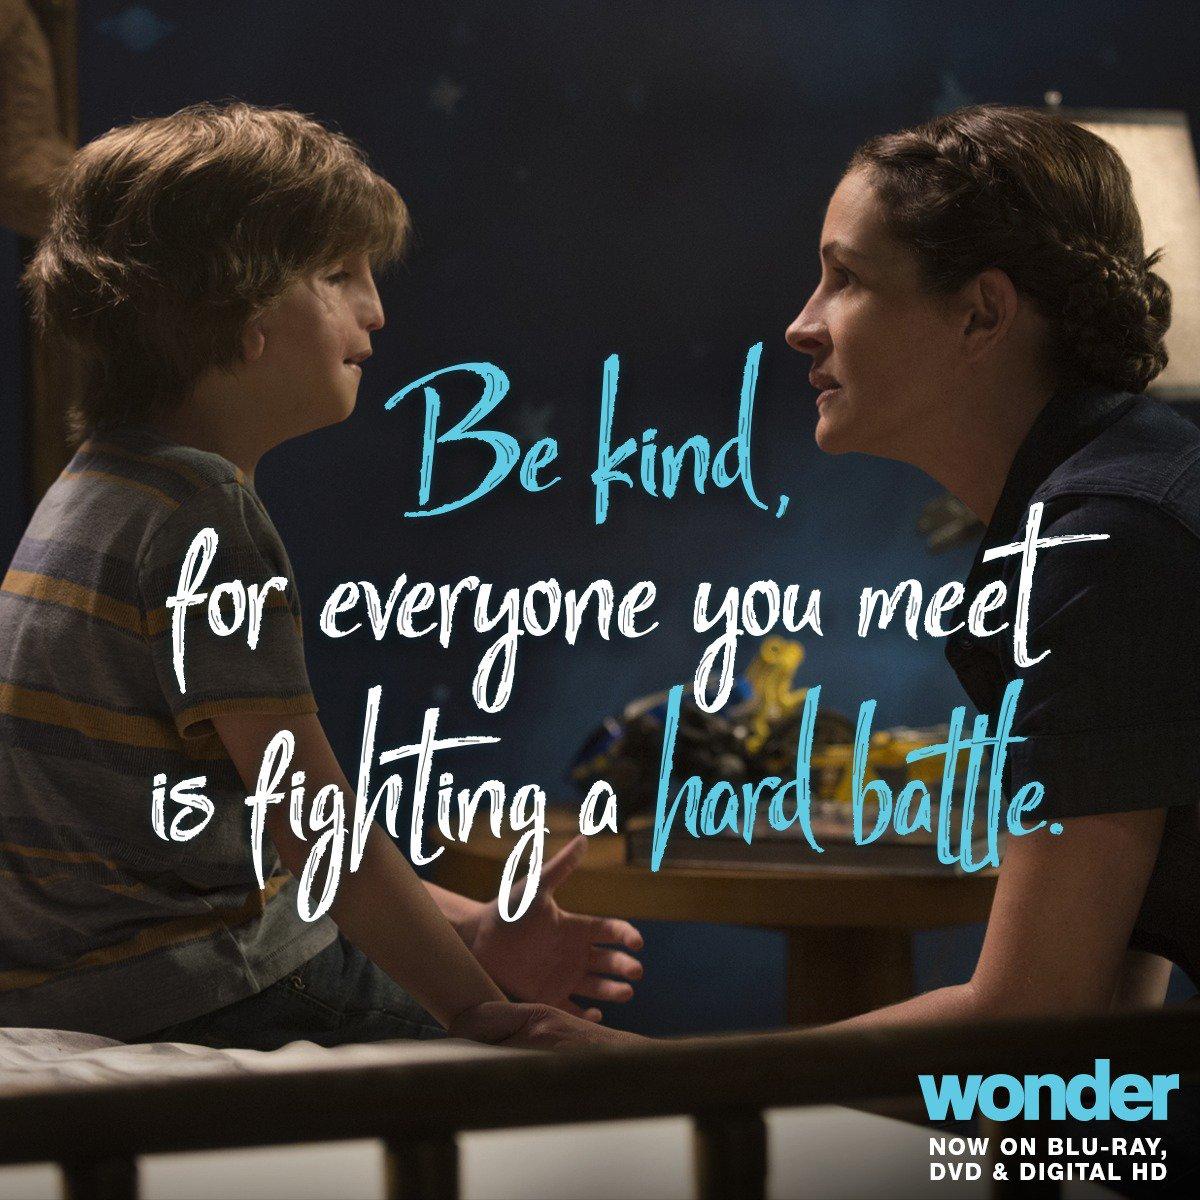 Wonder The Movie (@WonderTheMovie)